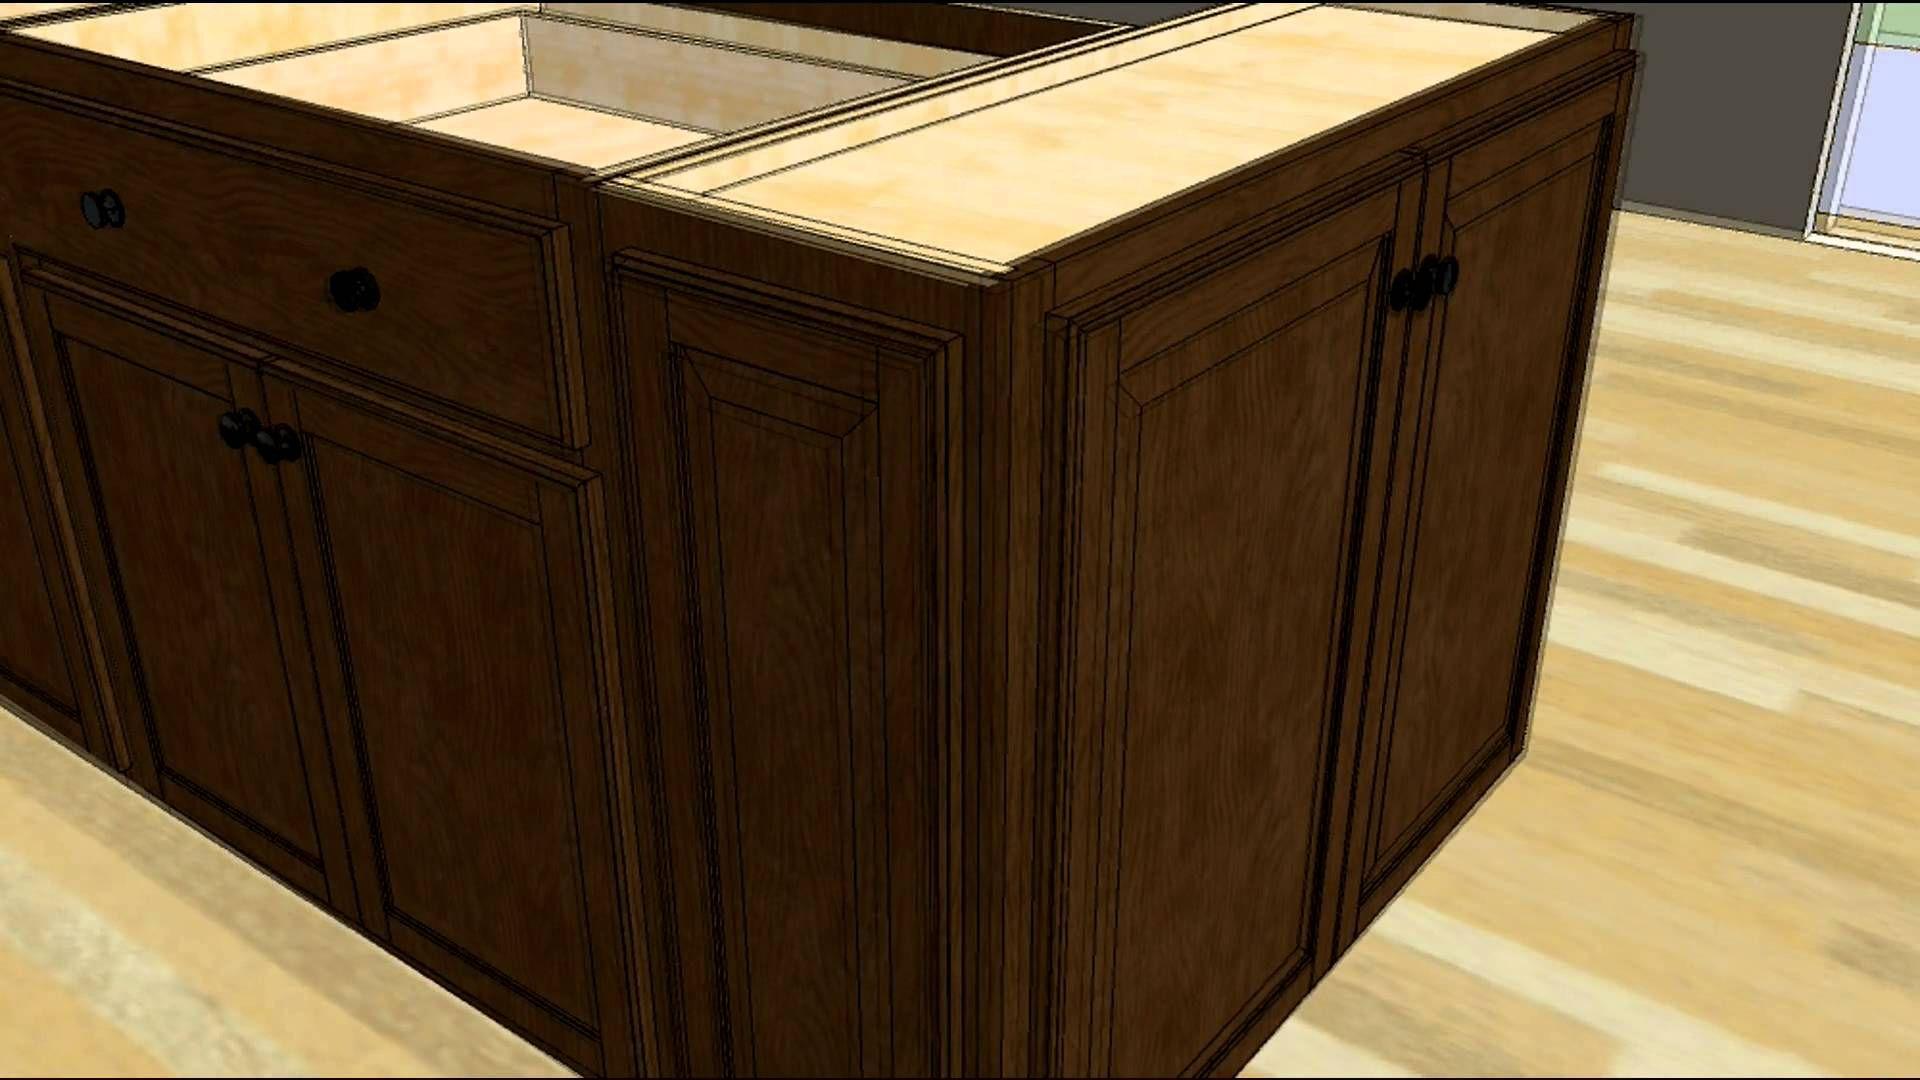 Diy Kitchen Island Using Cabinets